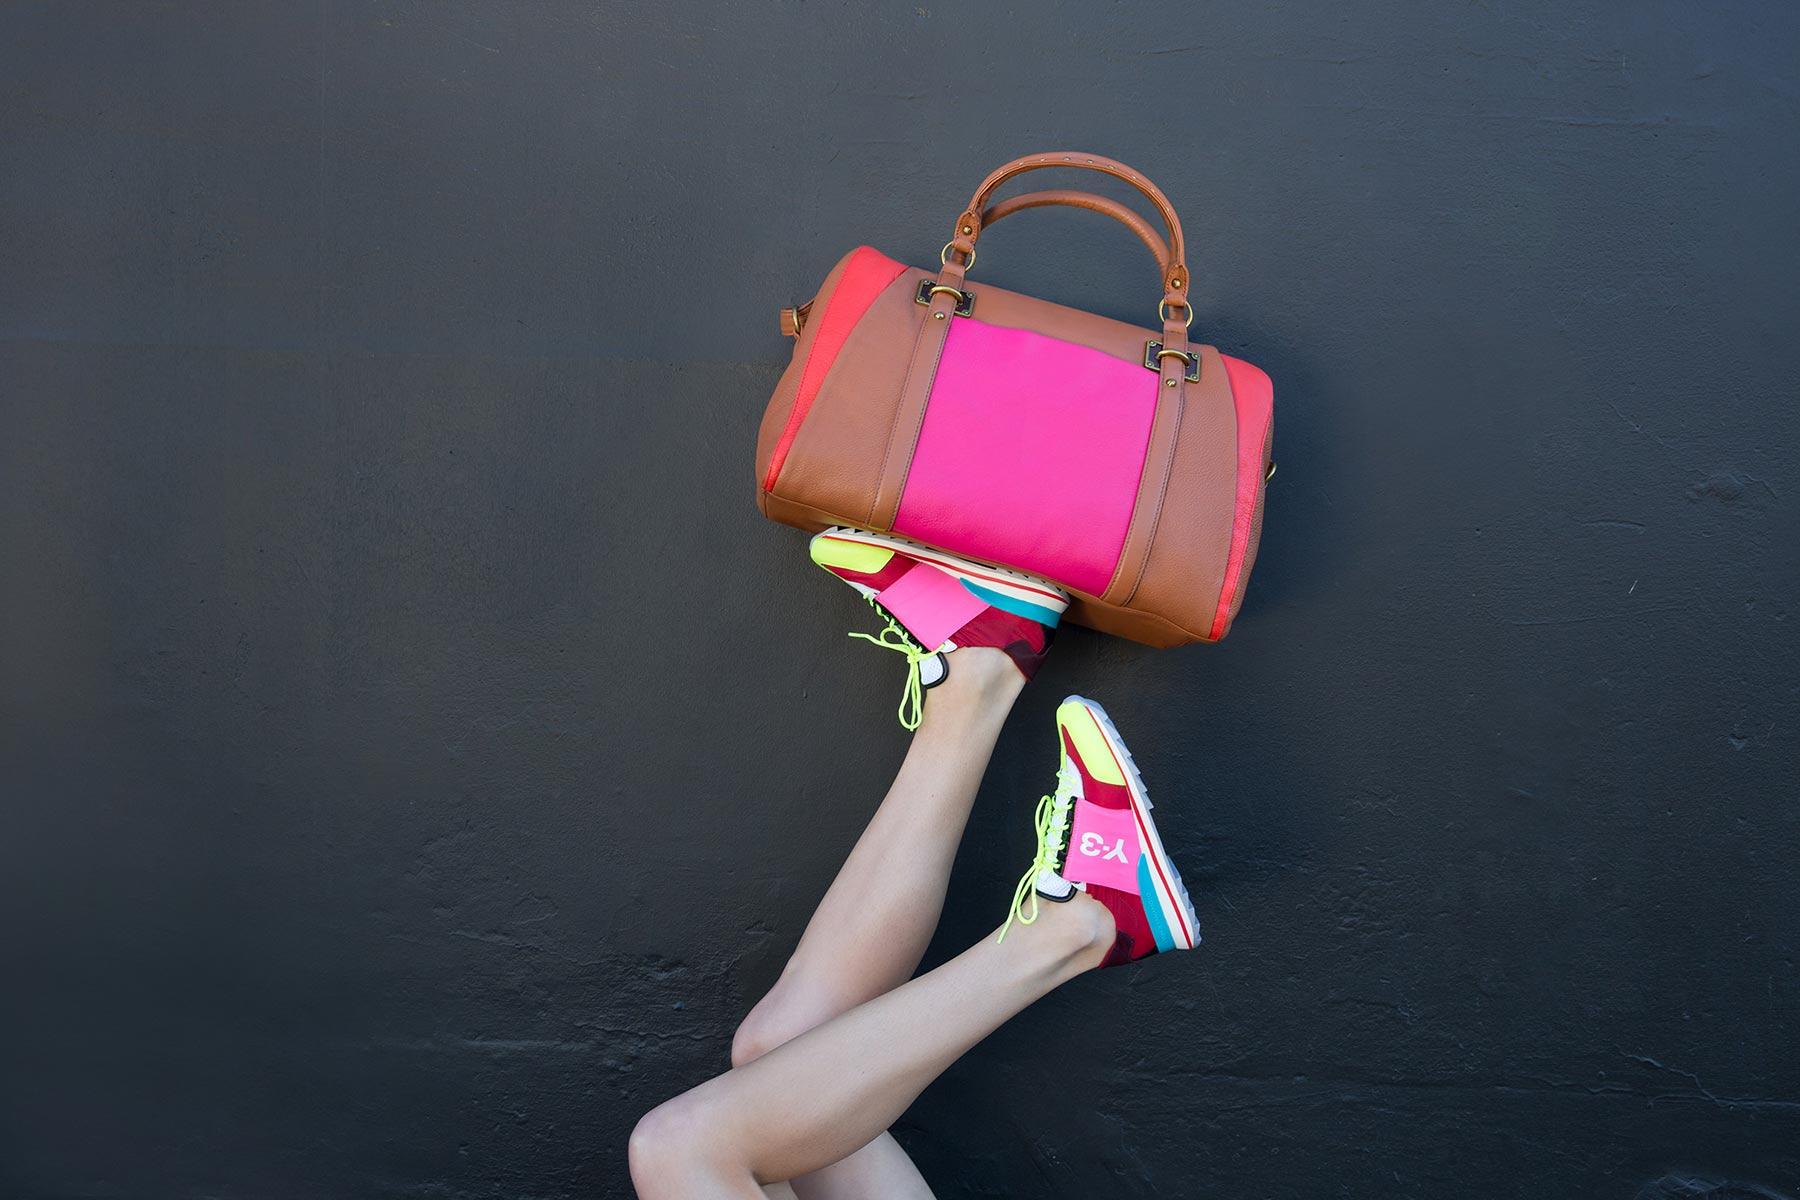 Claudia-Goetzelmann, photographer, interview, fashion, SanDisk, Hasselblad